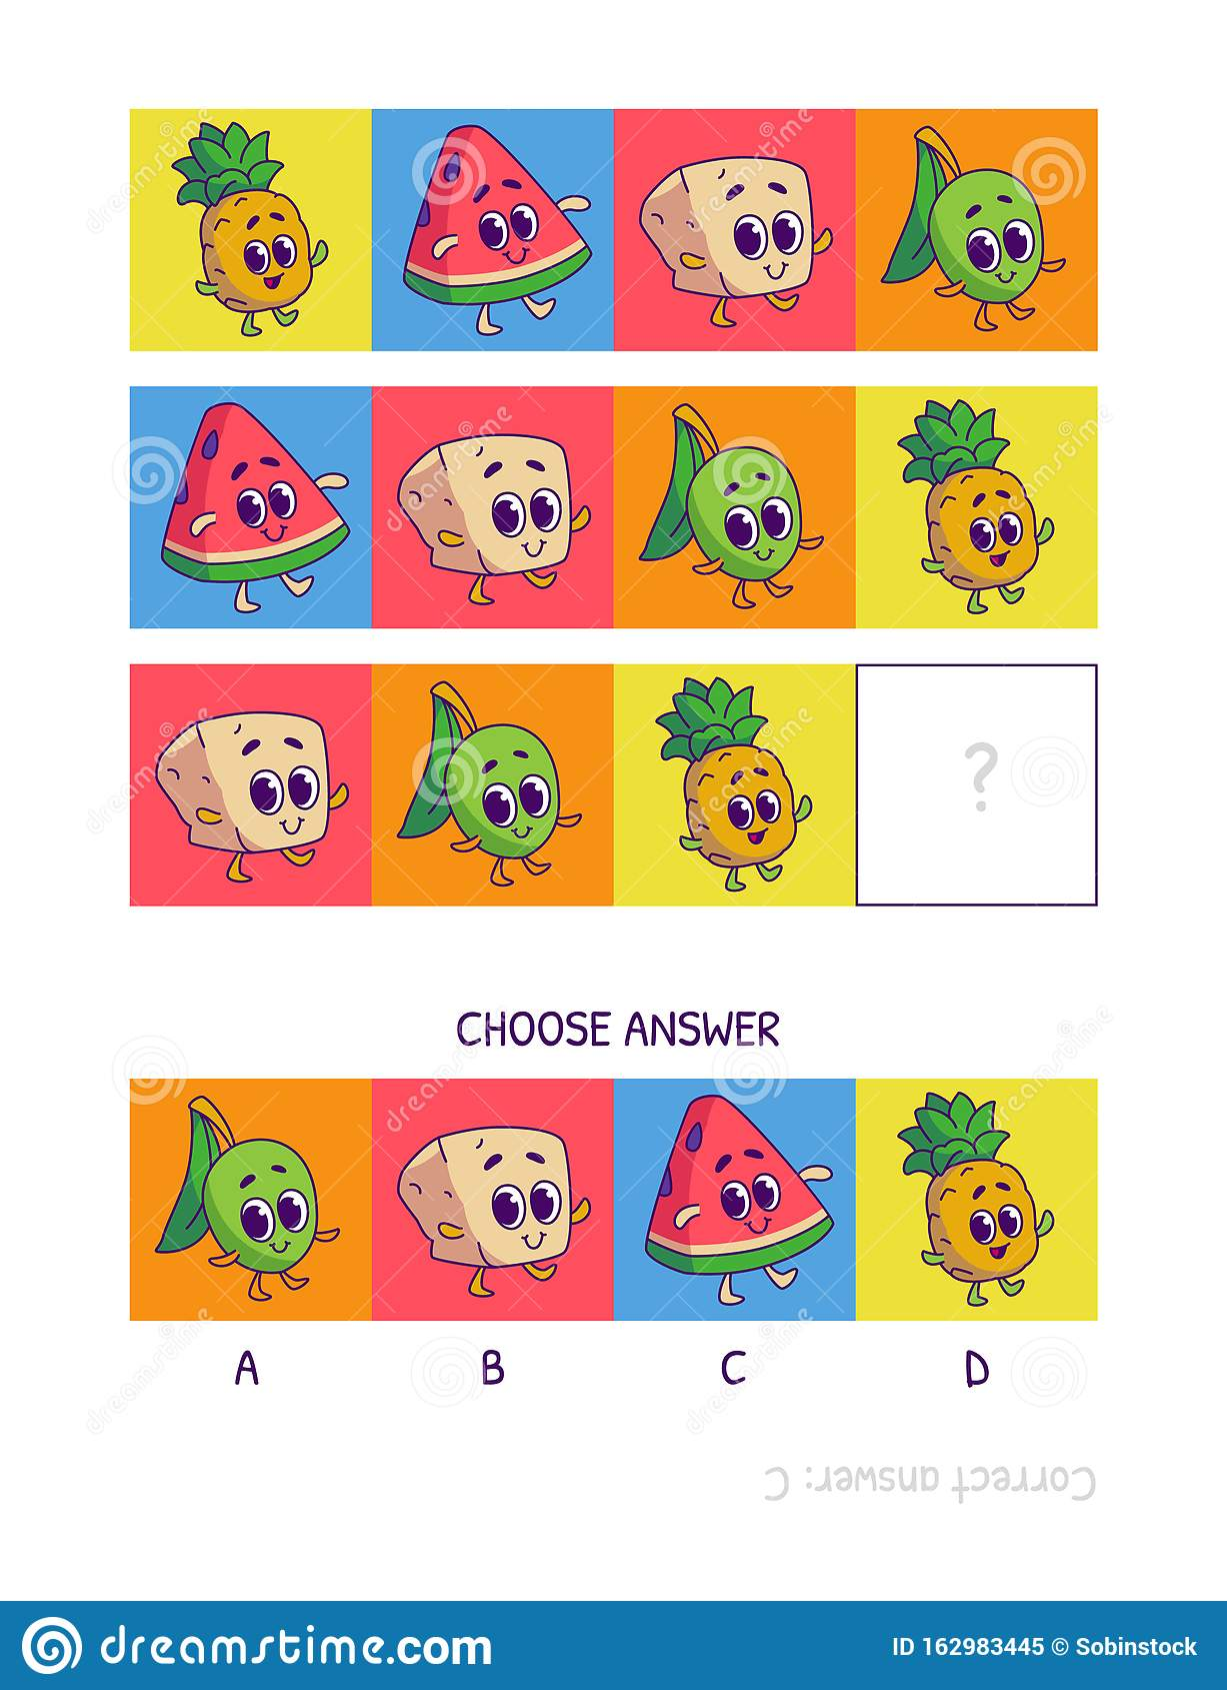 Cute Pineapple Watermelon Tofu Olive Logic Game For